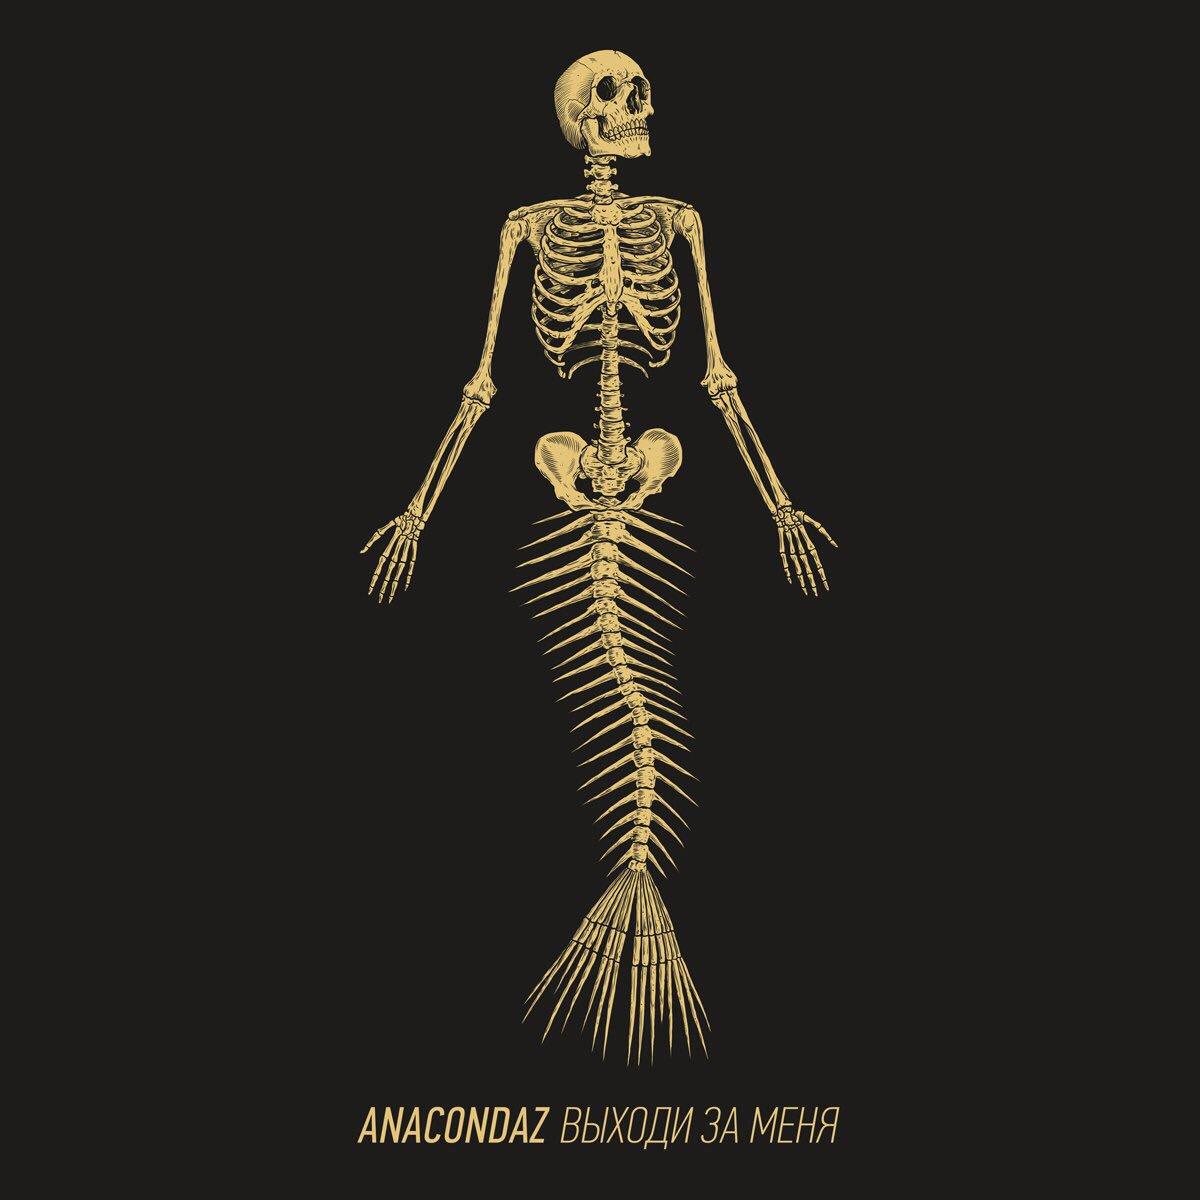 Anacondaz On Twitter Anacondaz